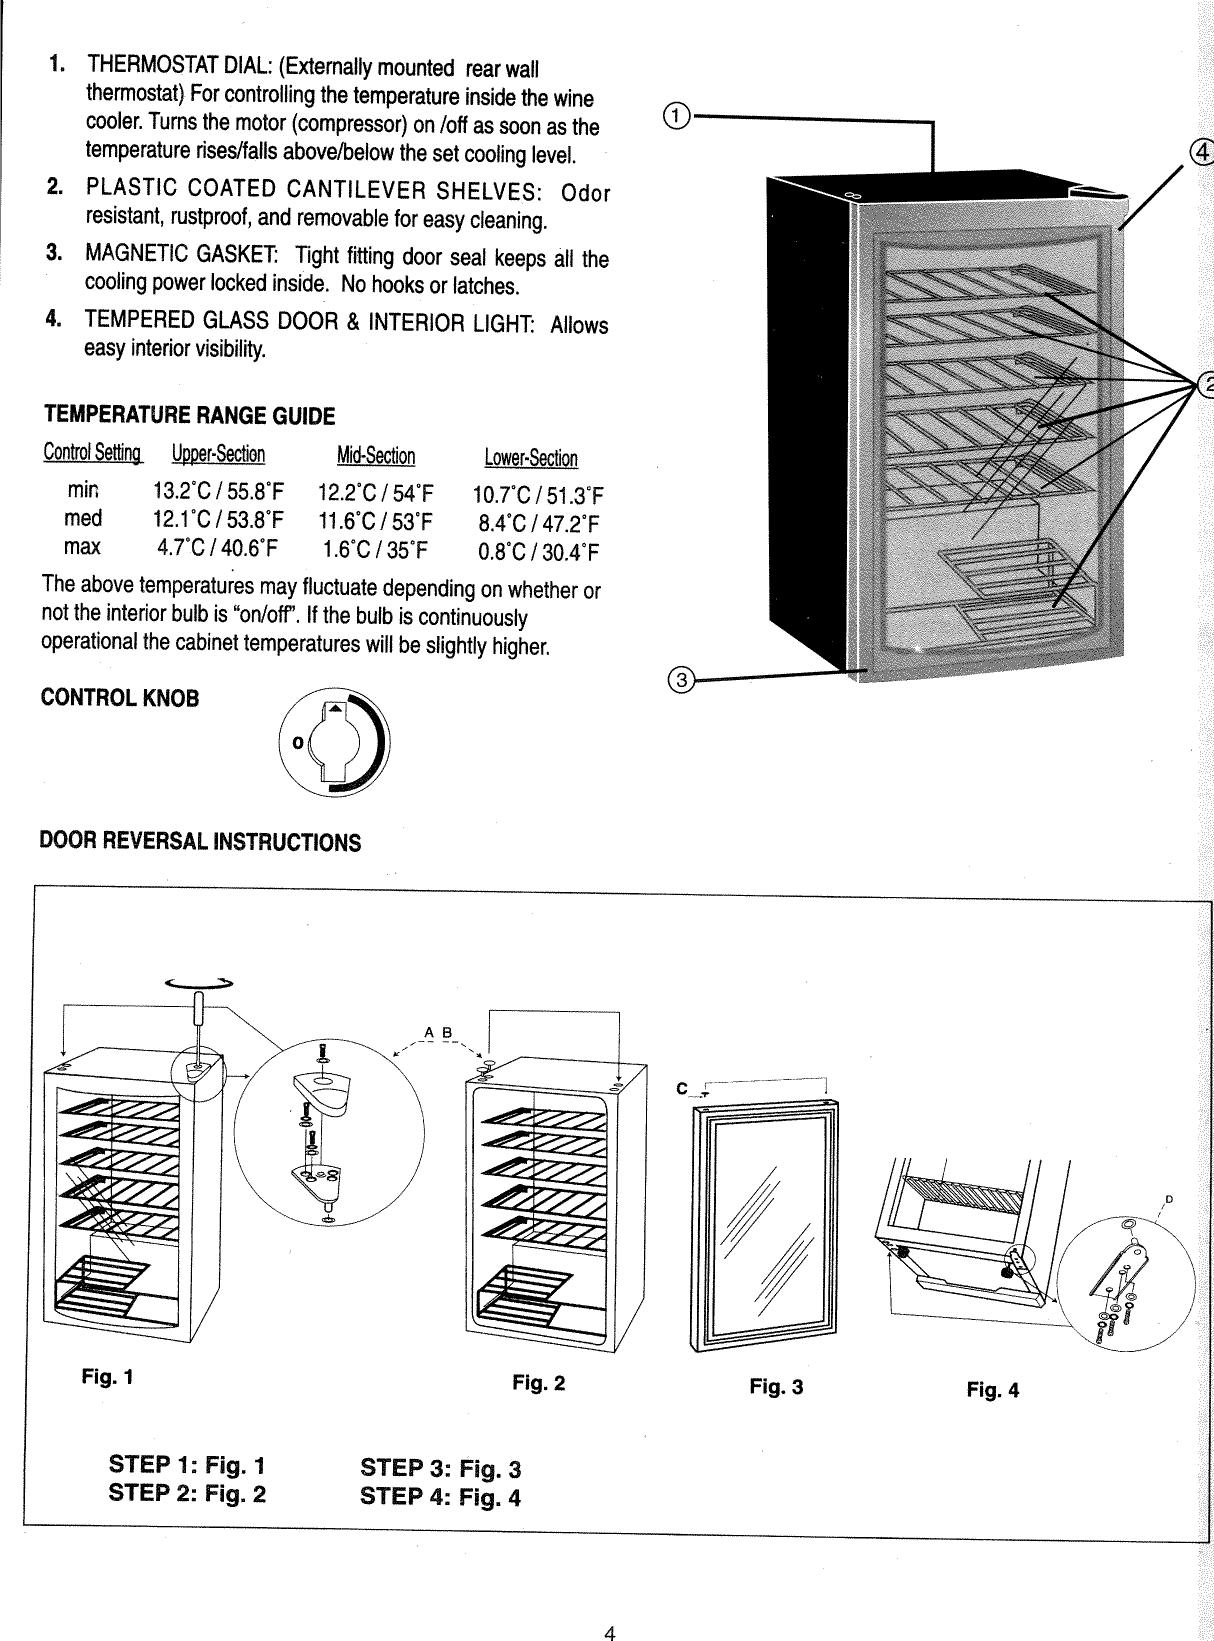 Danby Dwc350Blp Users Manual on